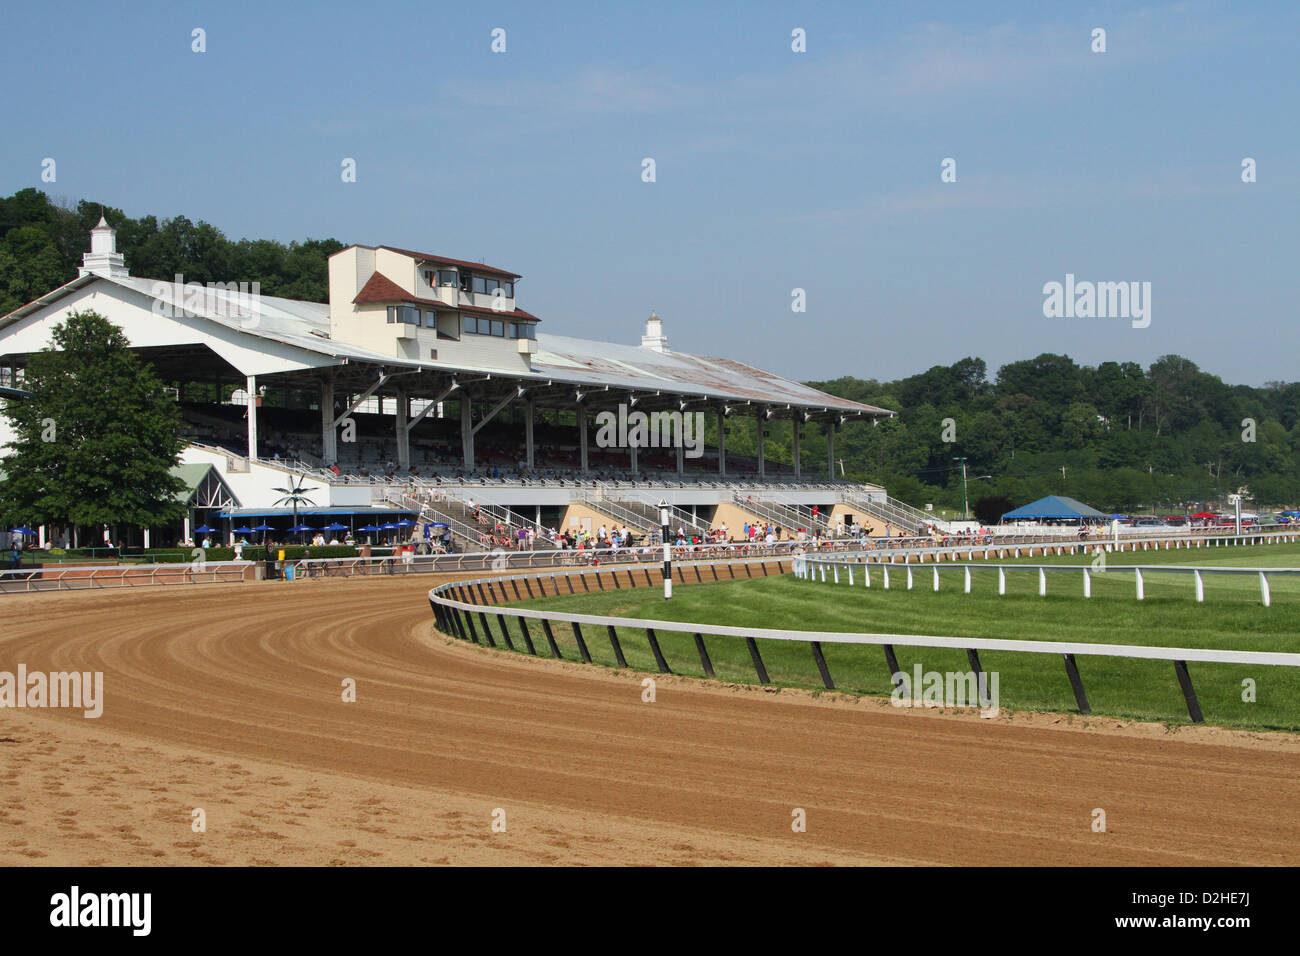 Horse Race track at River Downs, Cincinnati, Ohio, USA. - Stock Image